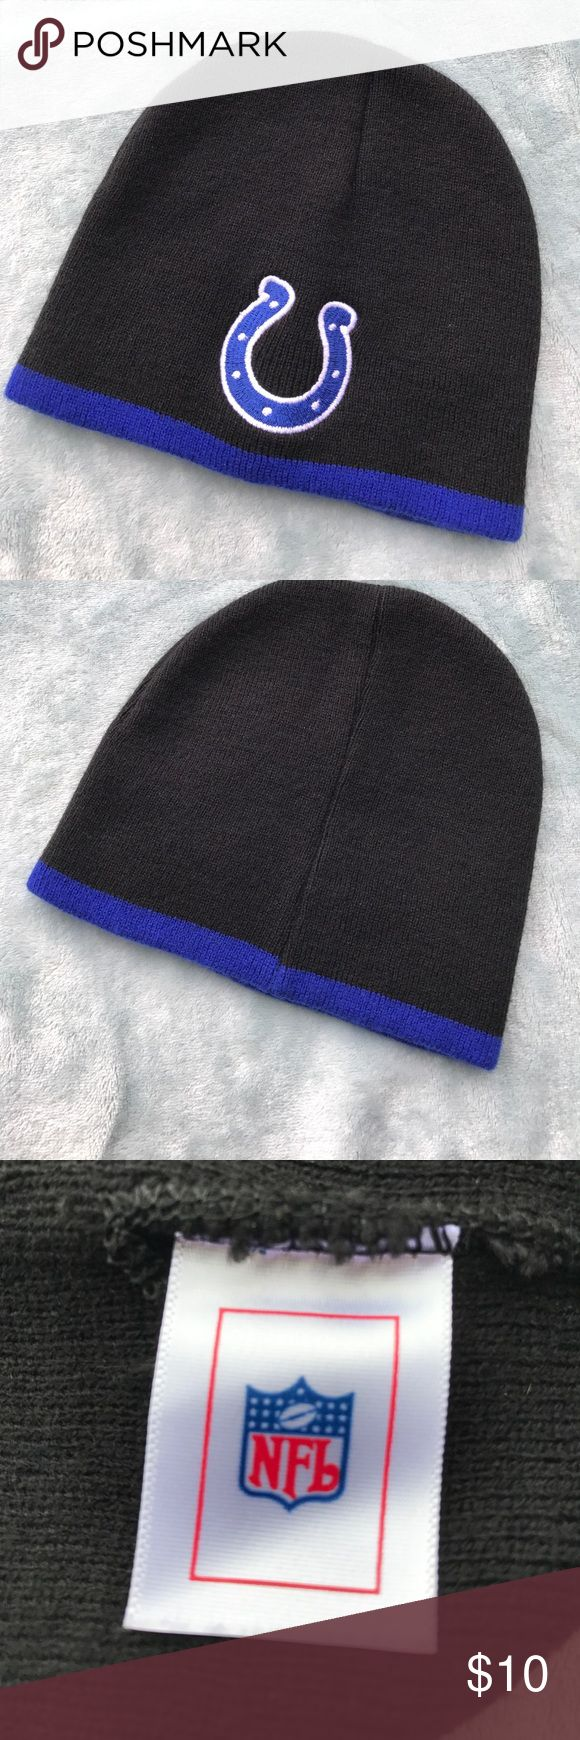 NFL COLTS BEANIE NFL COLTS BEANIE. EUC. NFL Accessories Hats